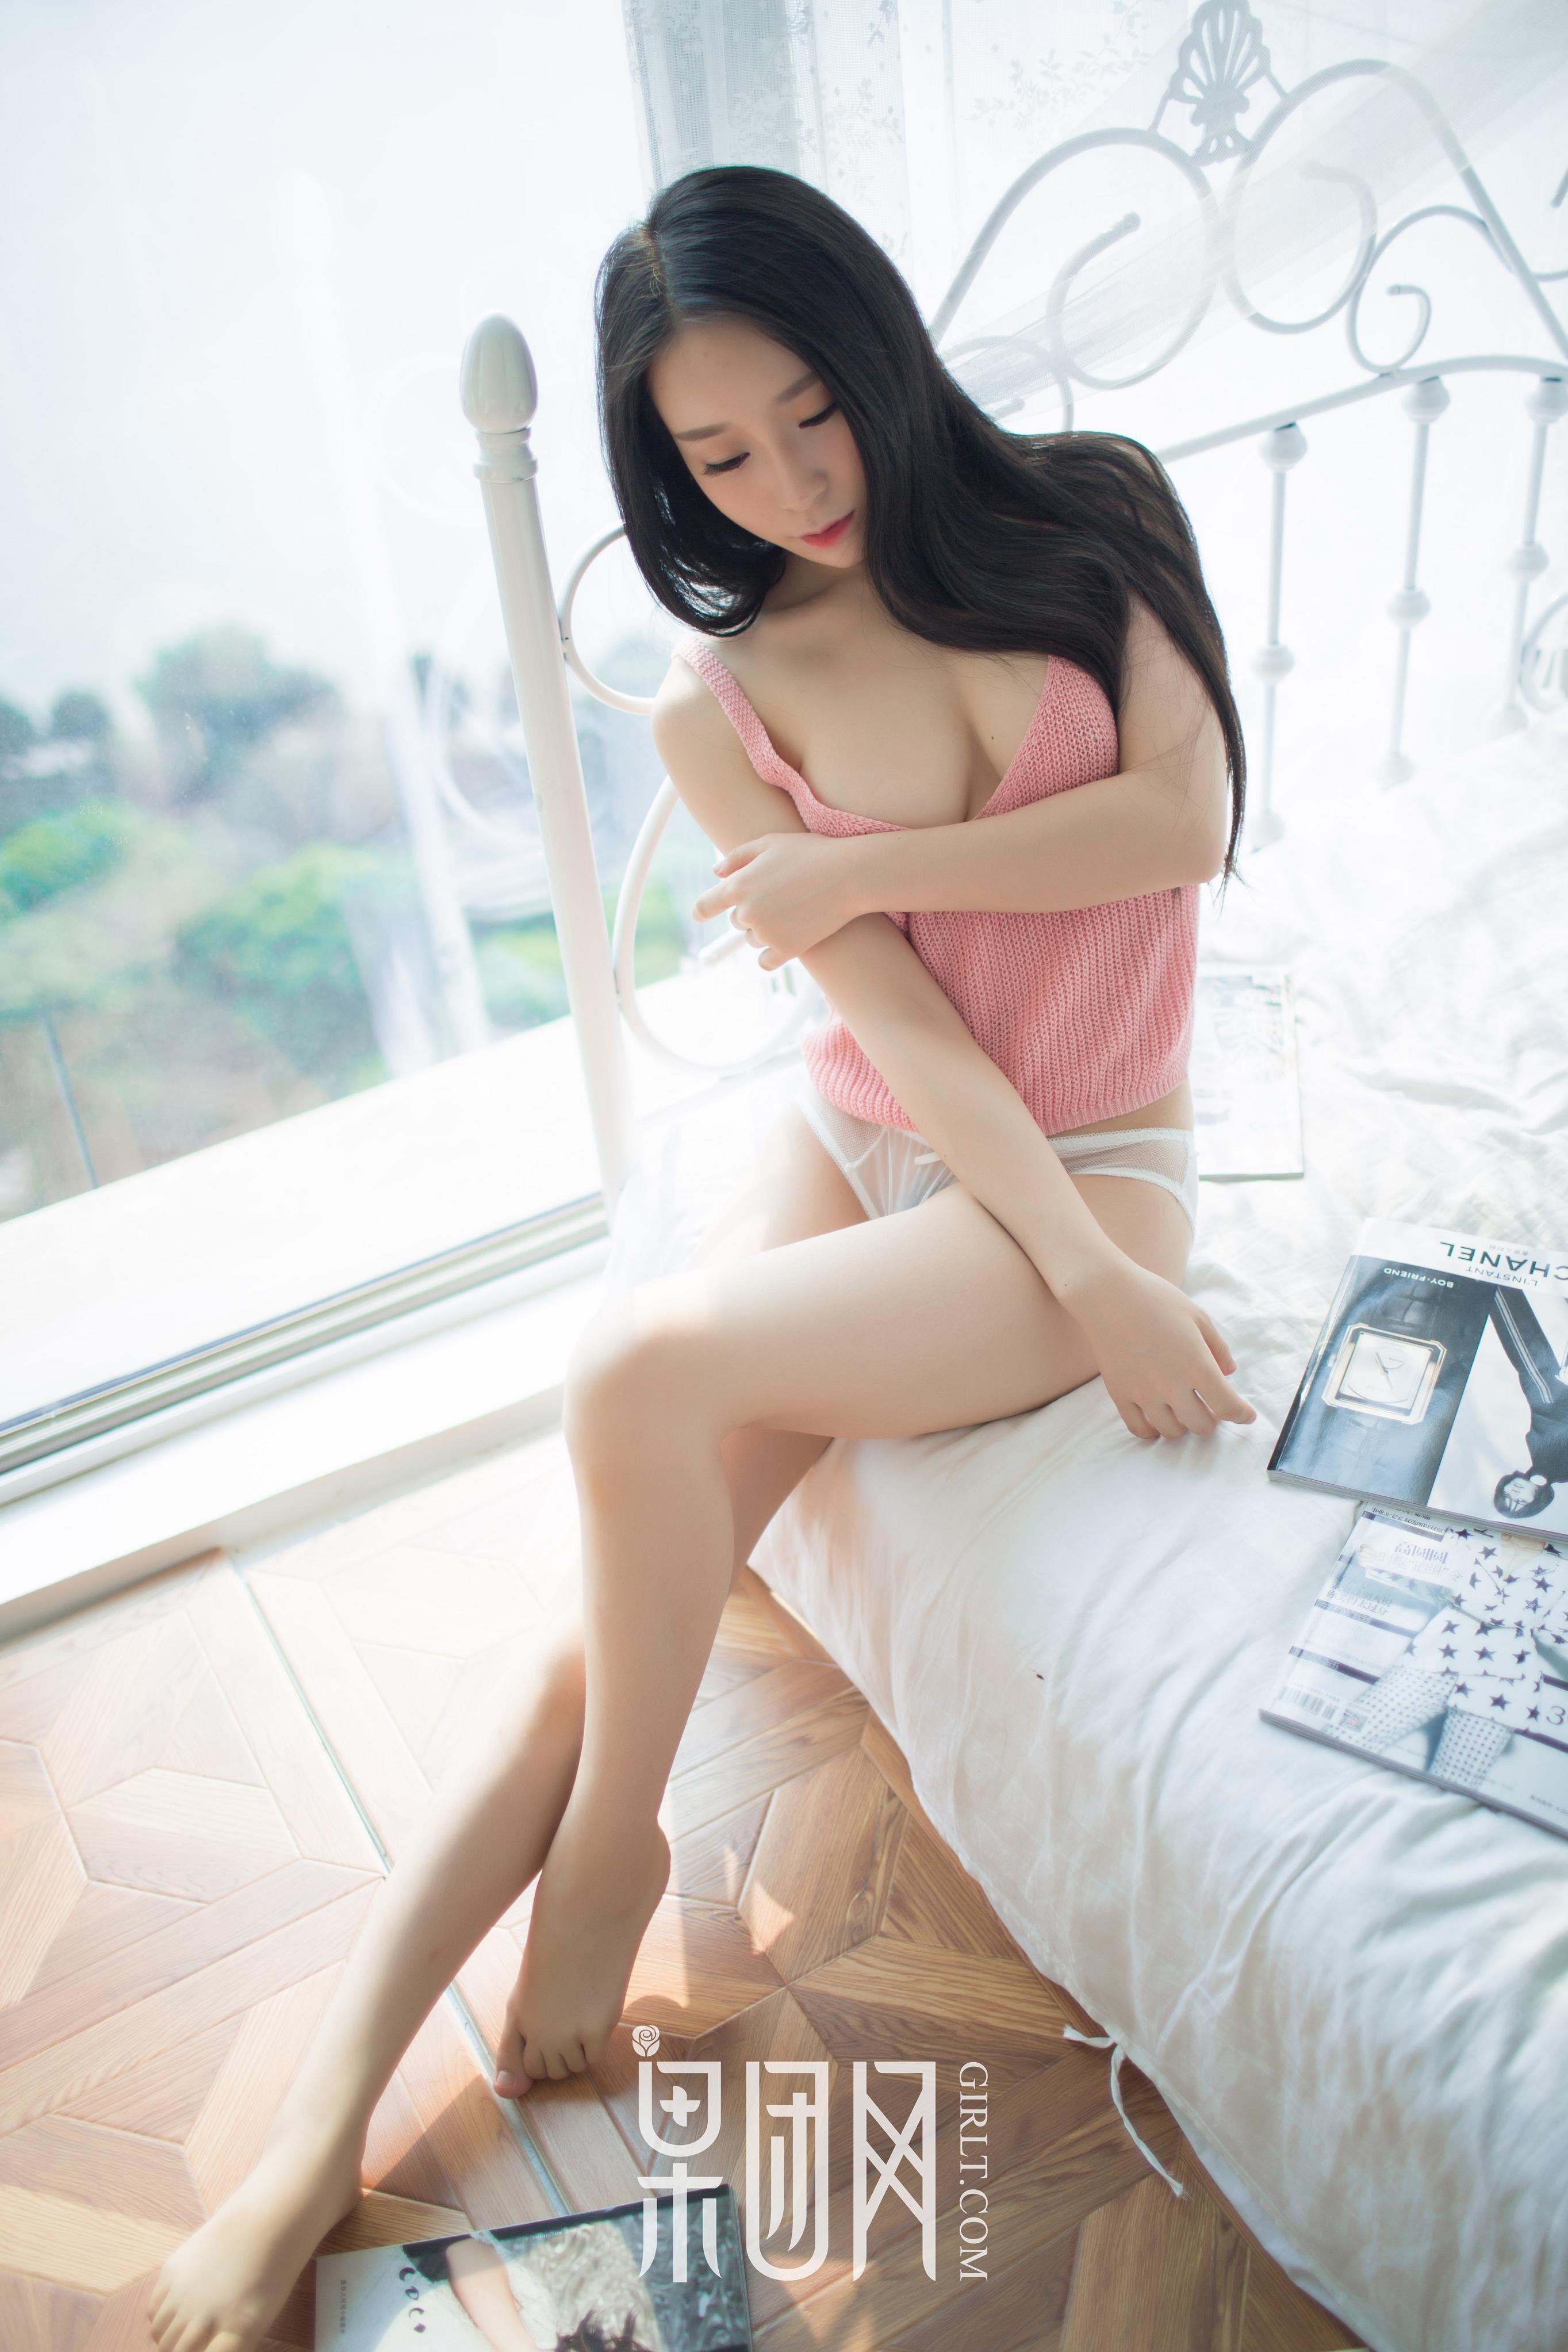 [Girlt果团网]XCJX20171230NO0009 红色吊带背心小美女性感私房写真集